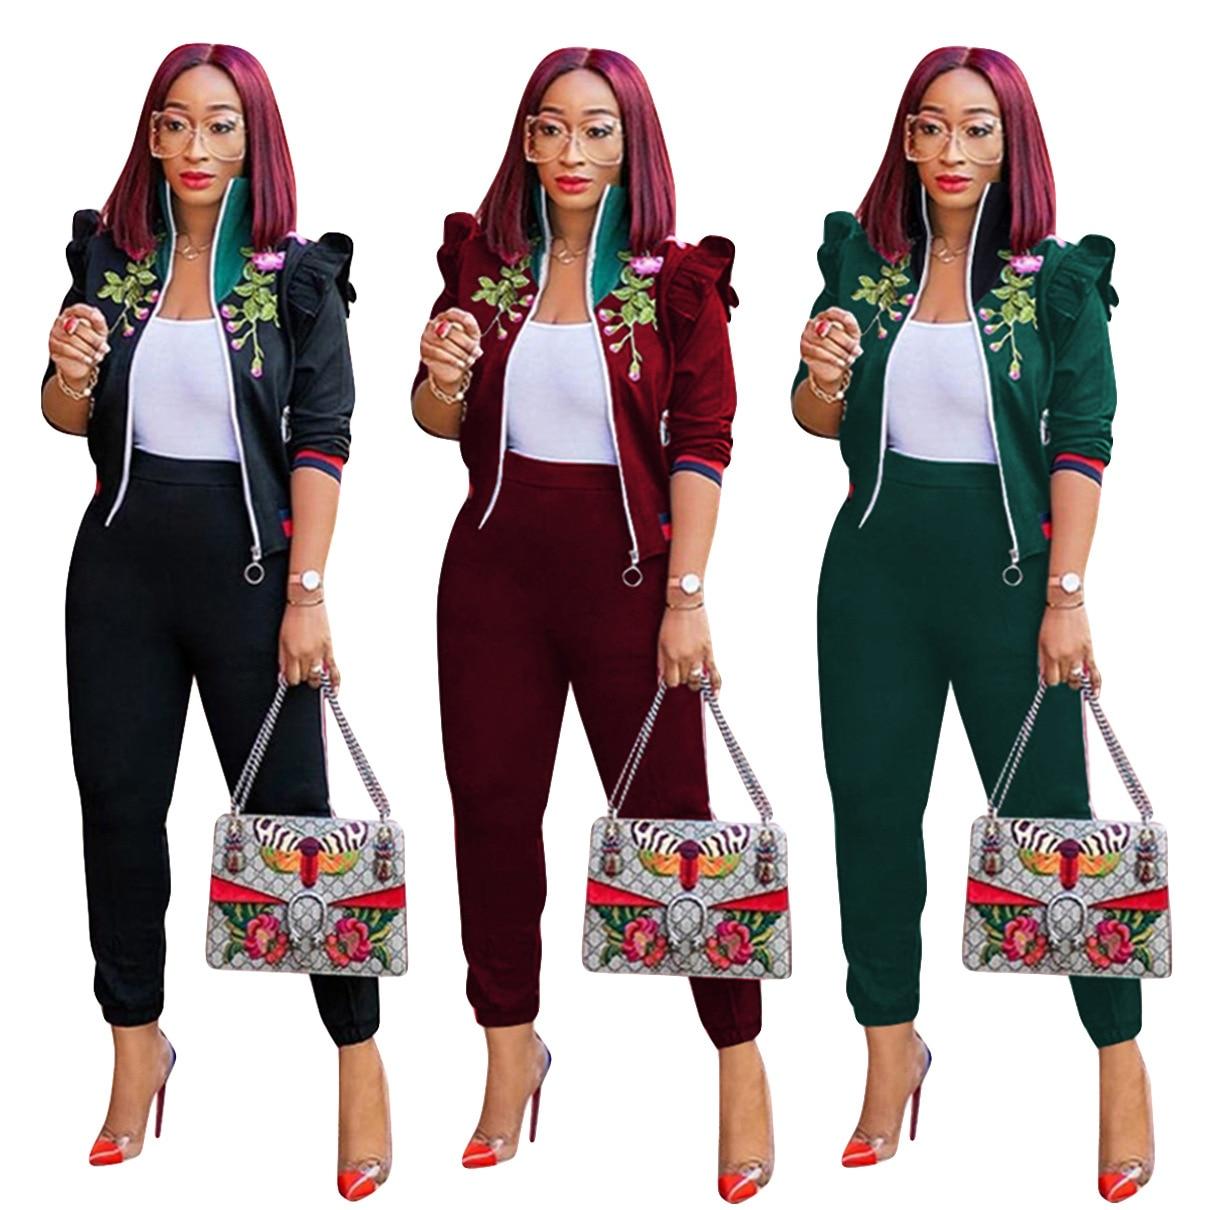 Autumn Winter New 3 Color 2 Piece Set Women Embroidery Long Sleeve Zipper Coat And Casual Sportswear Sweat Pants 2 Pcs Set